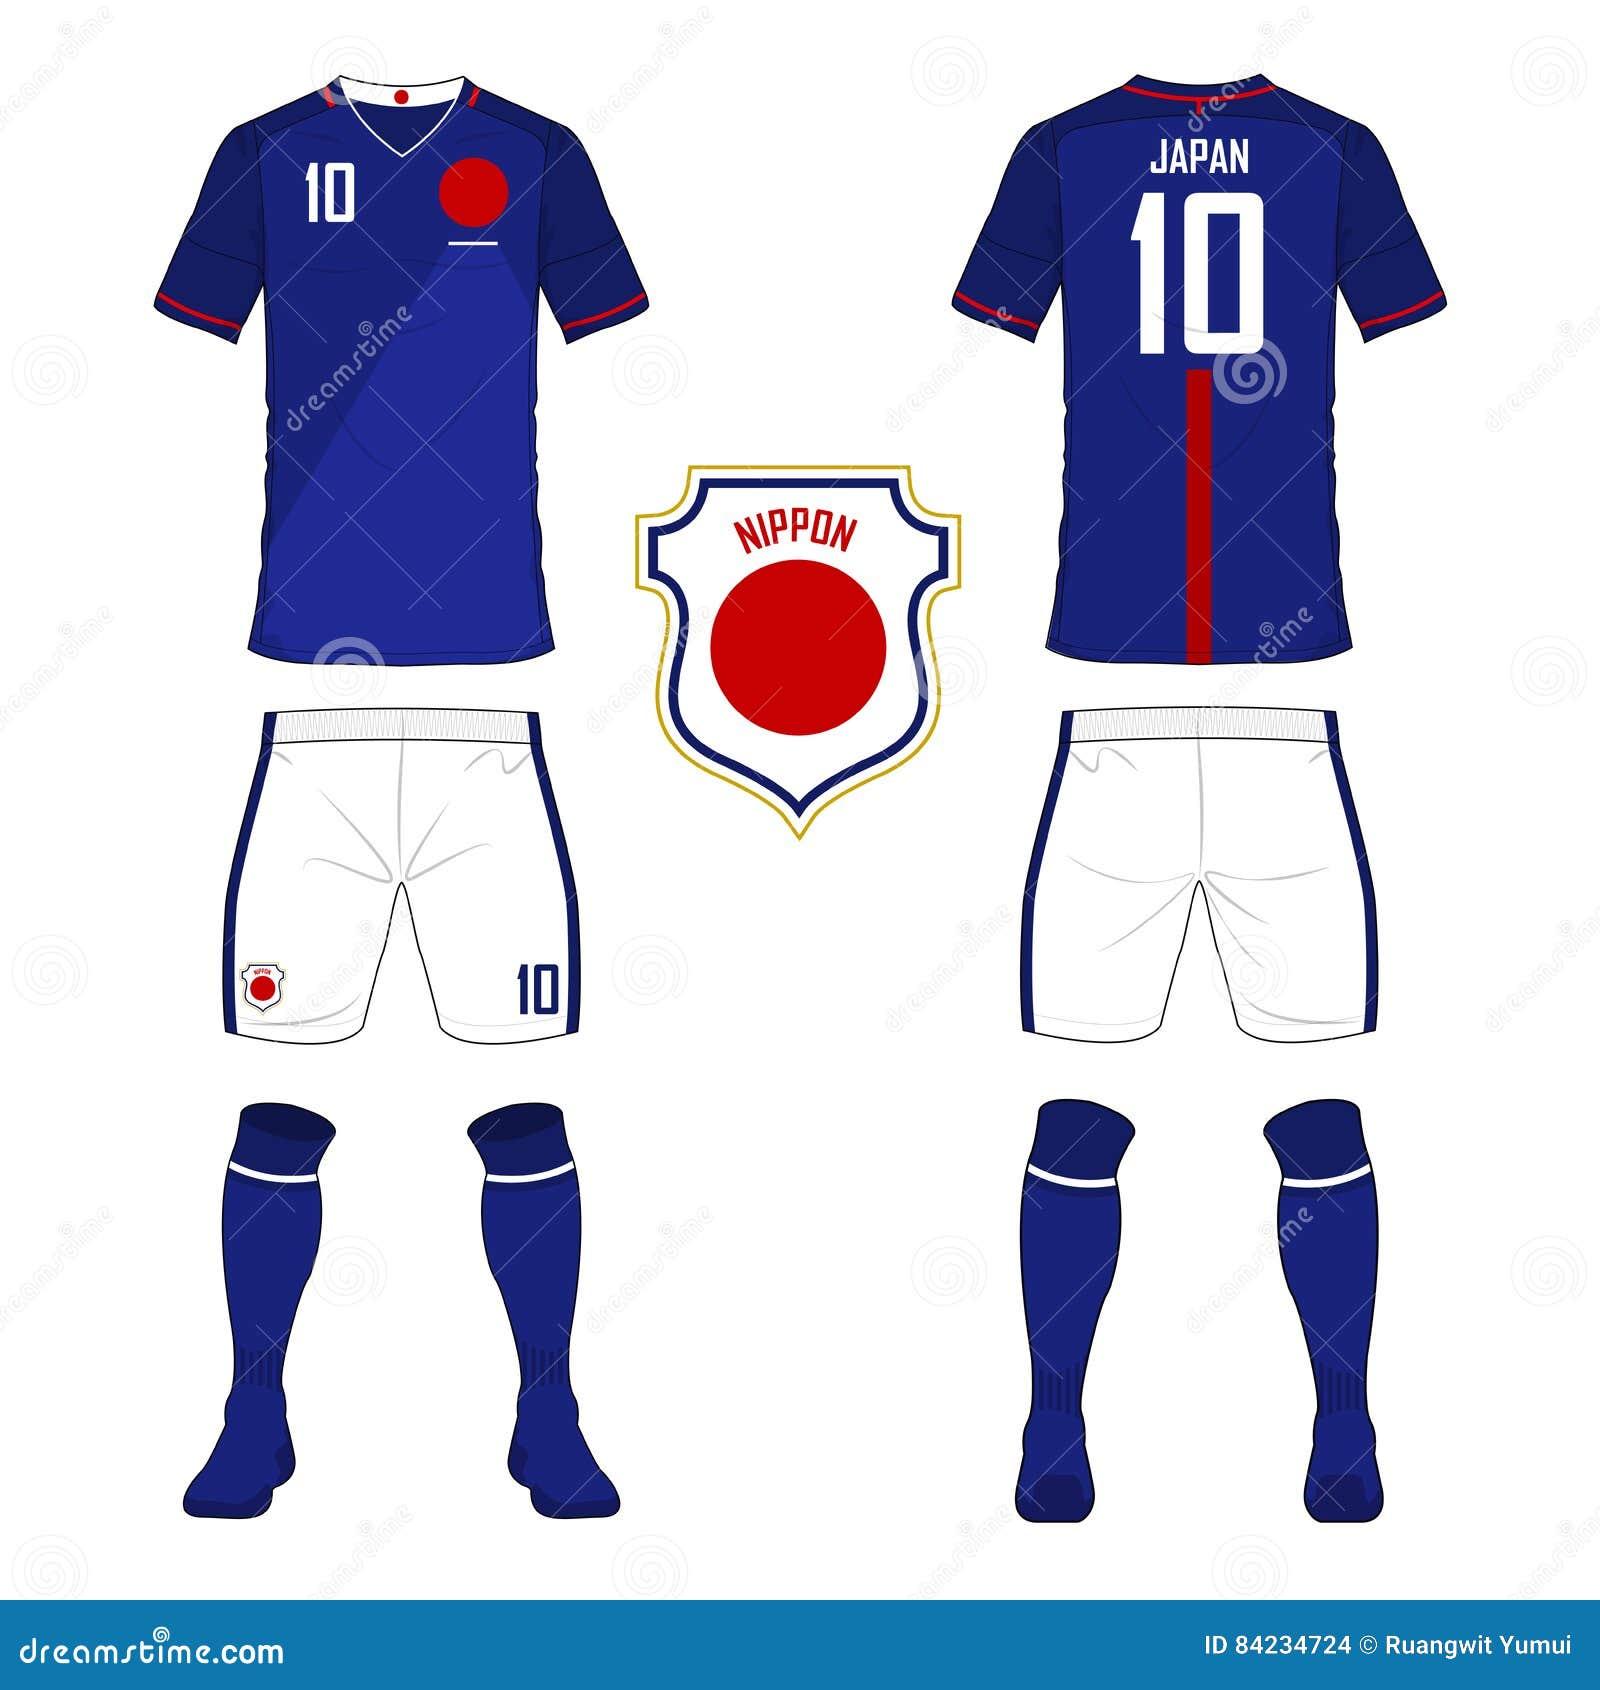 875eafd58 Set of soccer jersey or football kit template for Japan national football  team. stock illustration